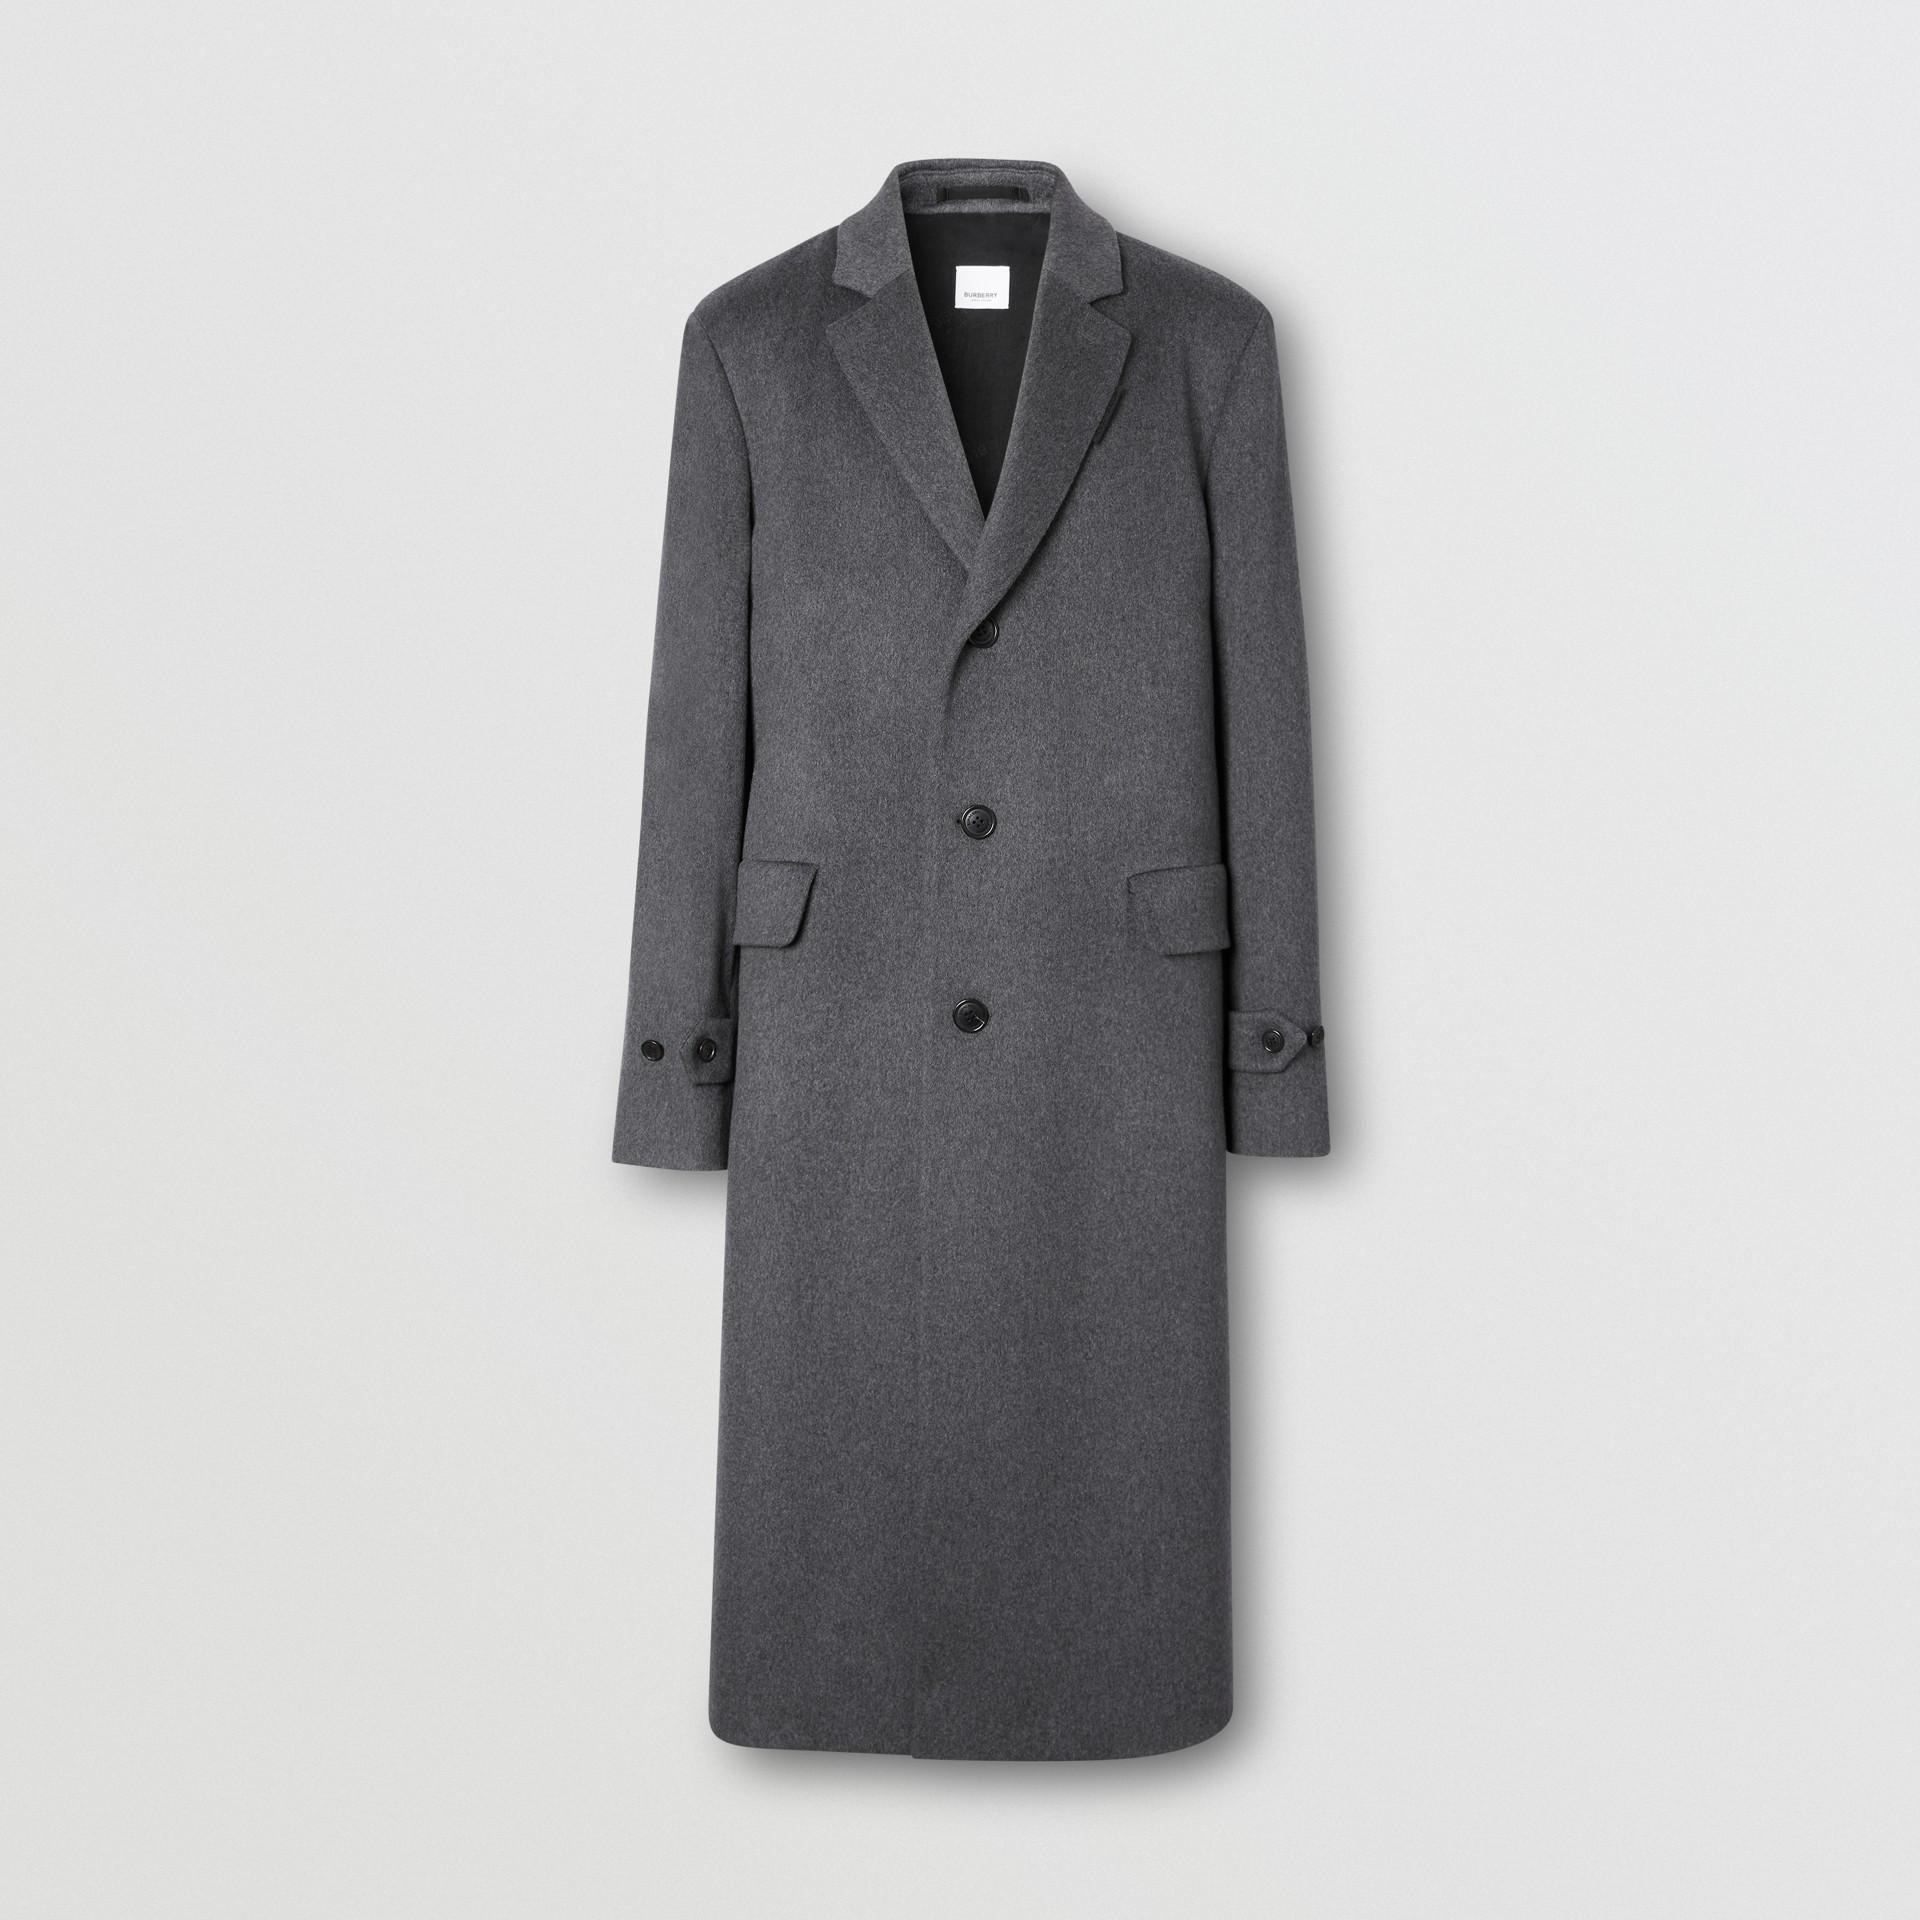 Cashmere Lab Coat in Pewter Melange - Men   Burberry - gallery image 3